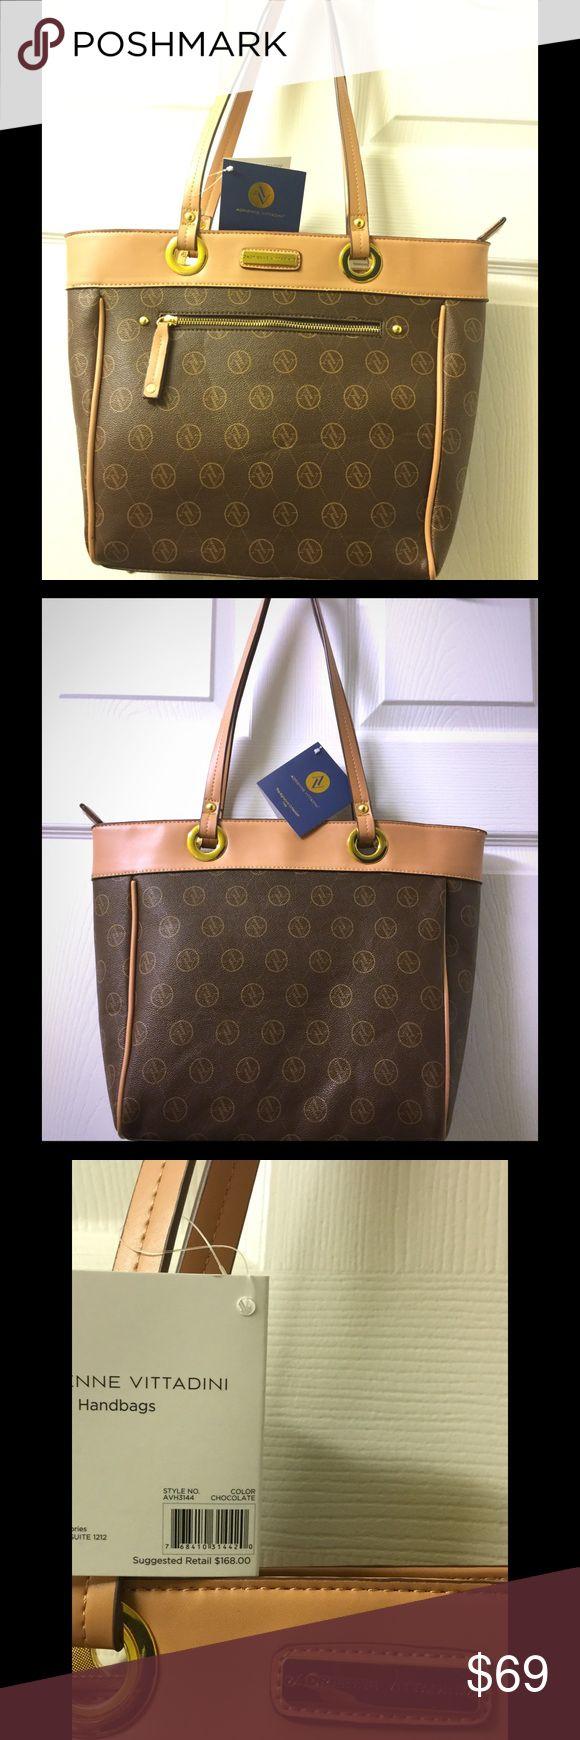 Authentic Adrienne Vittadini Handbag New Authentic Adrienne Vittadini Handbag, chocolate color, medium size, very nice purse,European brand. Adrienne Vittadini Bags Shoulder Bags